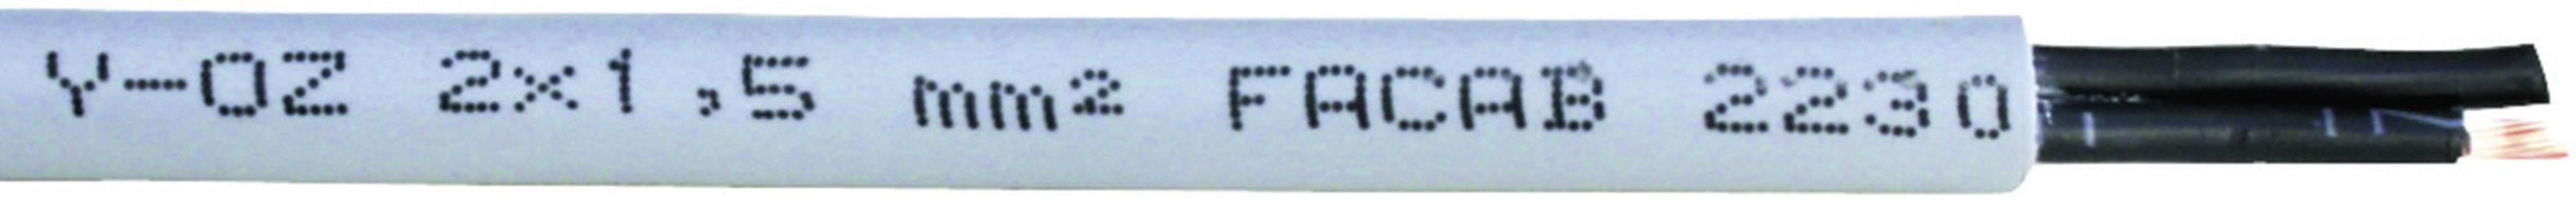 Riadiaci kábel Faber Kabel YSLY-OZ 030624, 3 x 1 mm², vonkajší Ø 6.10 mm, 500 V, metrový tovar, sivá